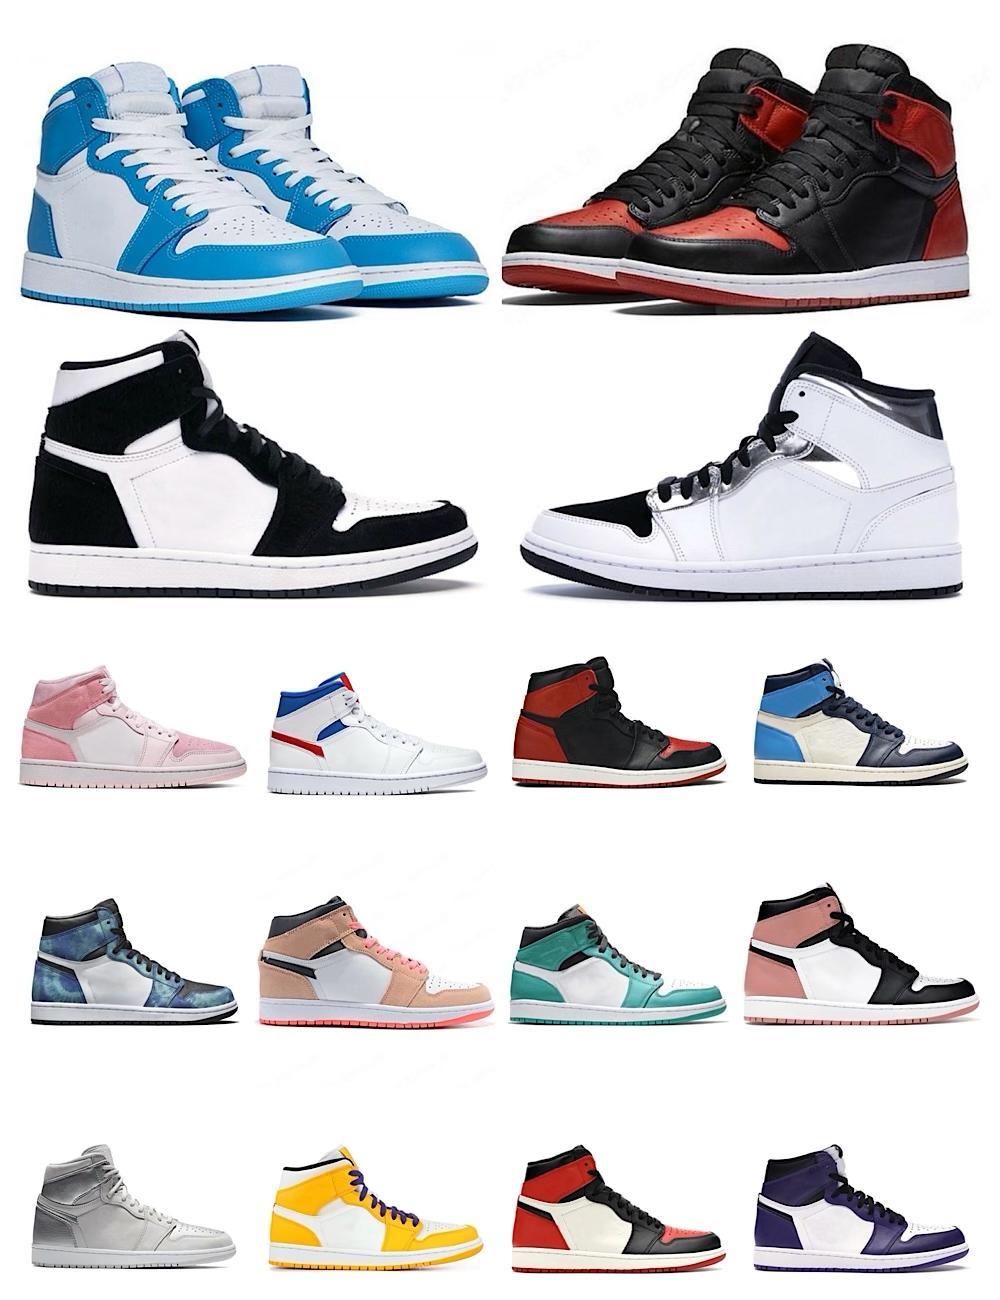 Men shoe and women fashion1S flat shoes black red blue size 36-45